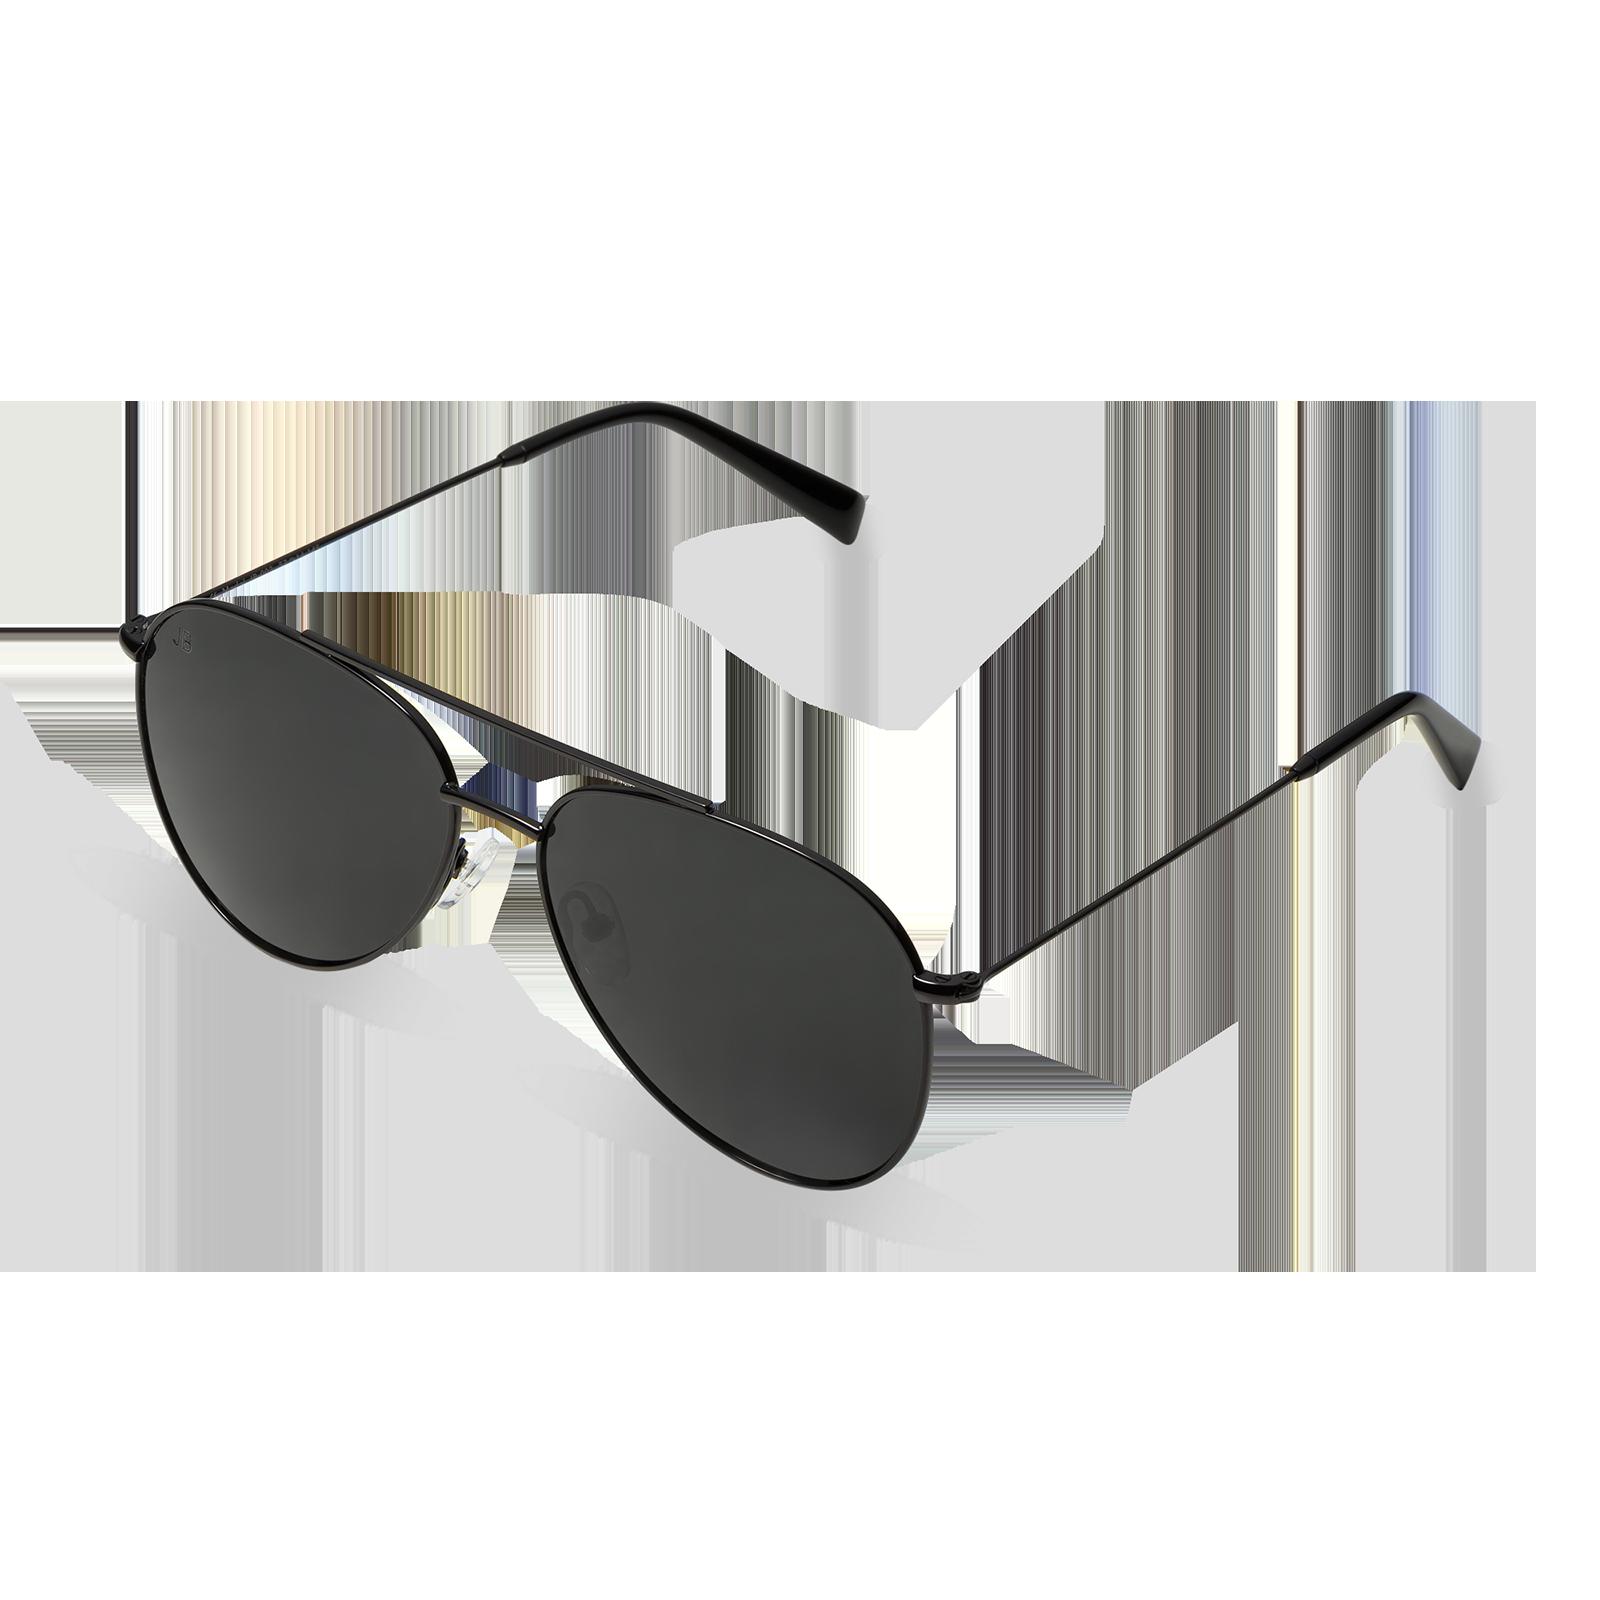 sunglasses product photography, sunglasses product photo